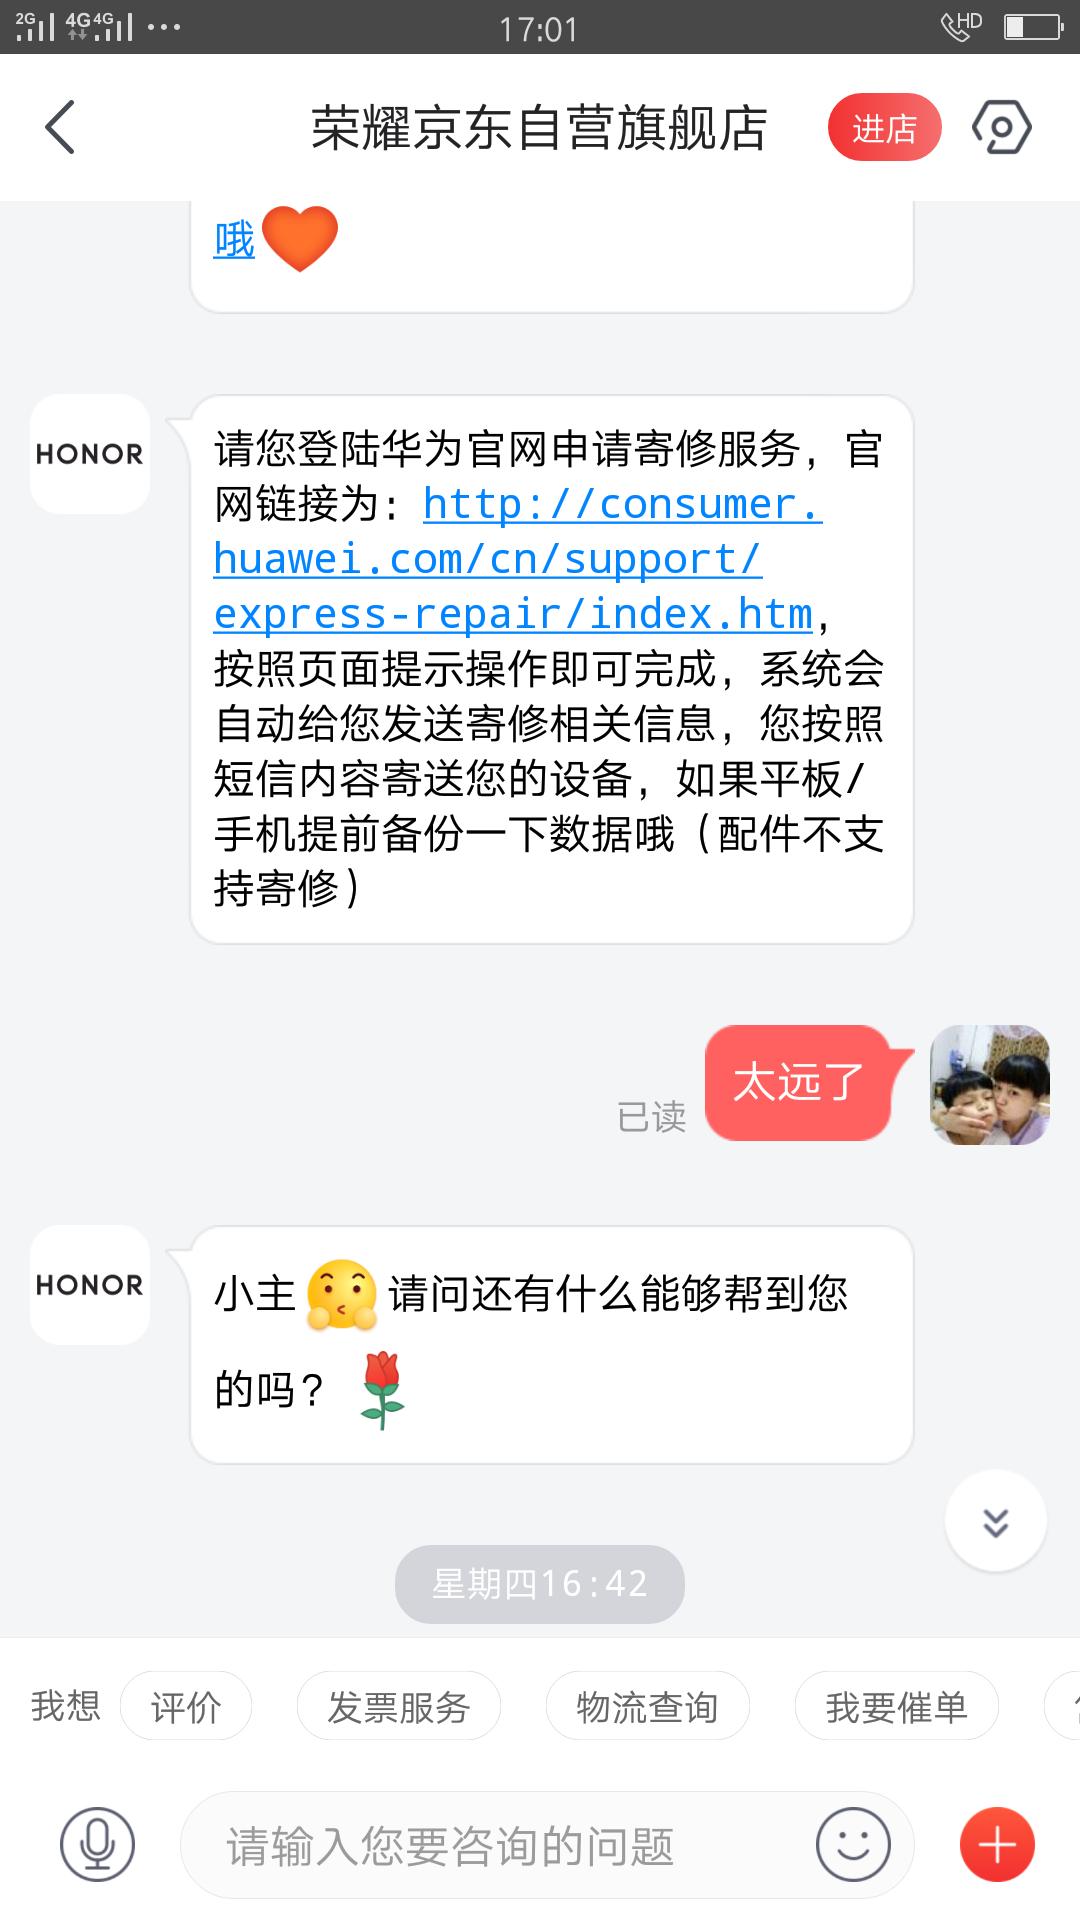 Screenshot_2019-08-24-17-01-24-65.png